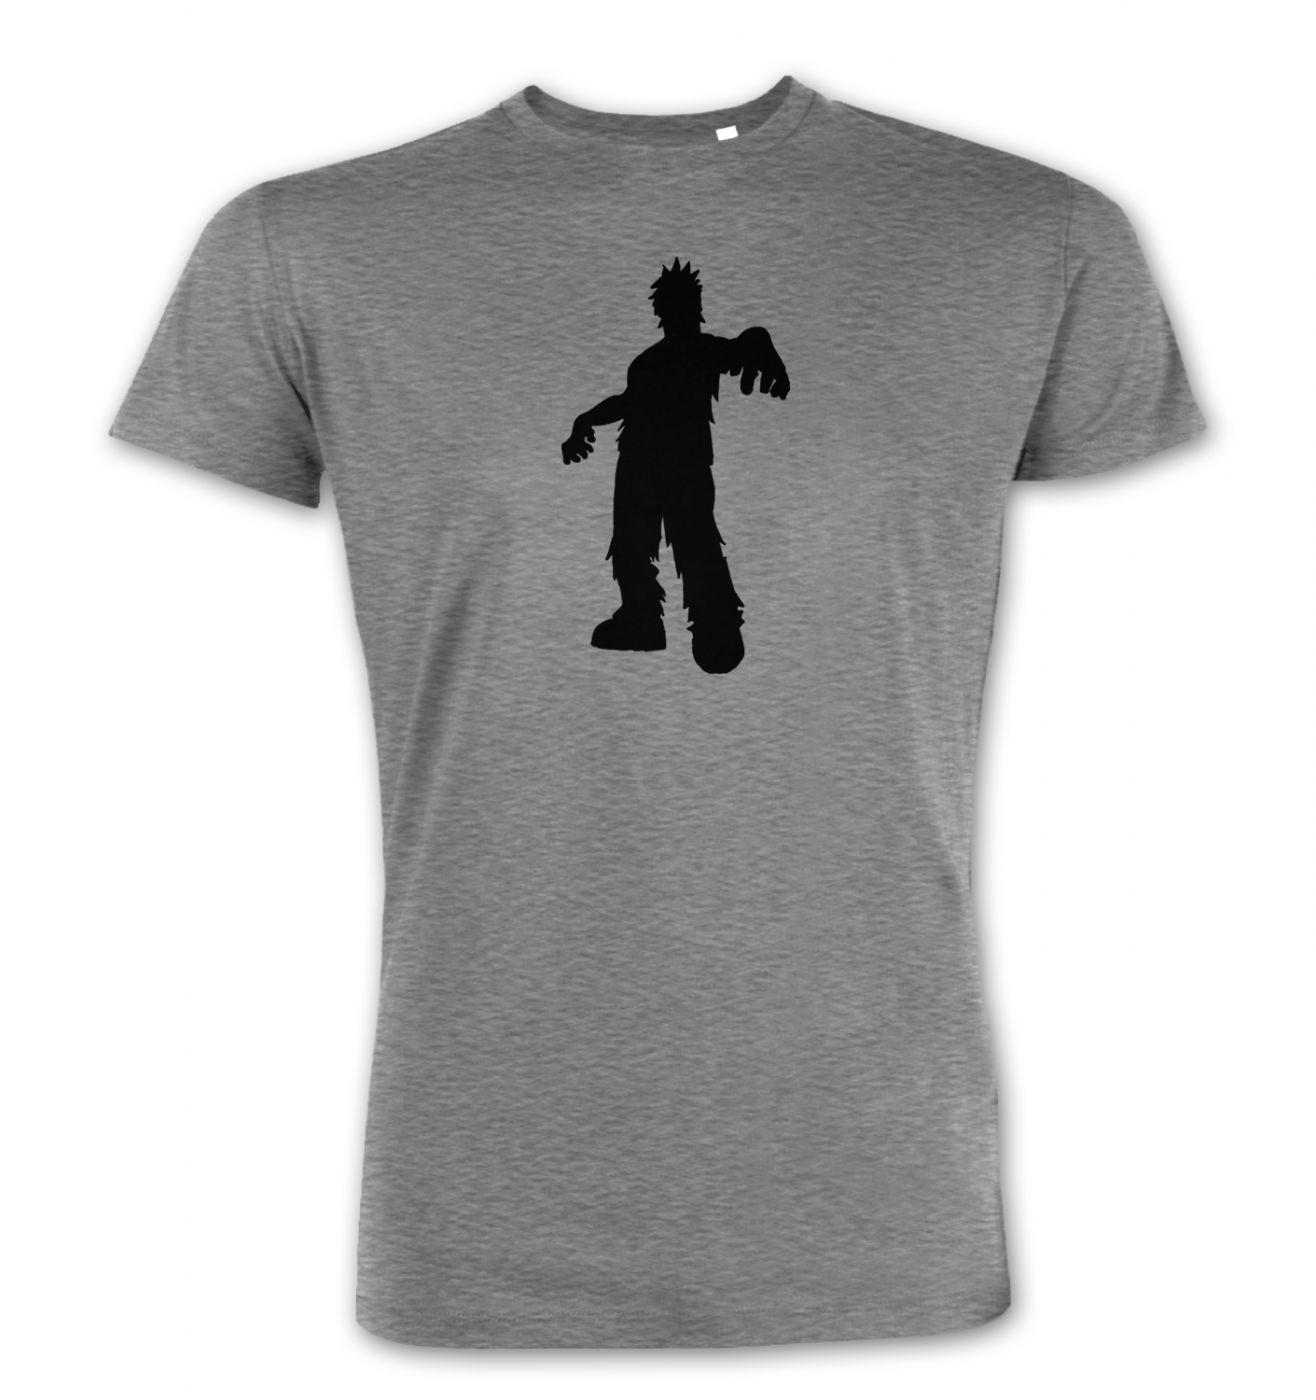 Zombie Silhouette men's Premium t-shirt